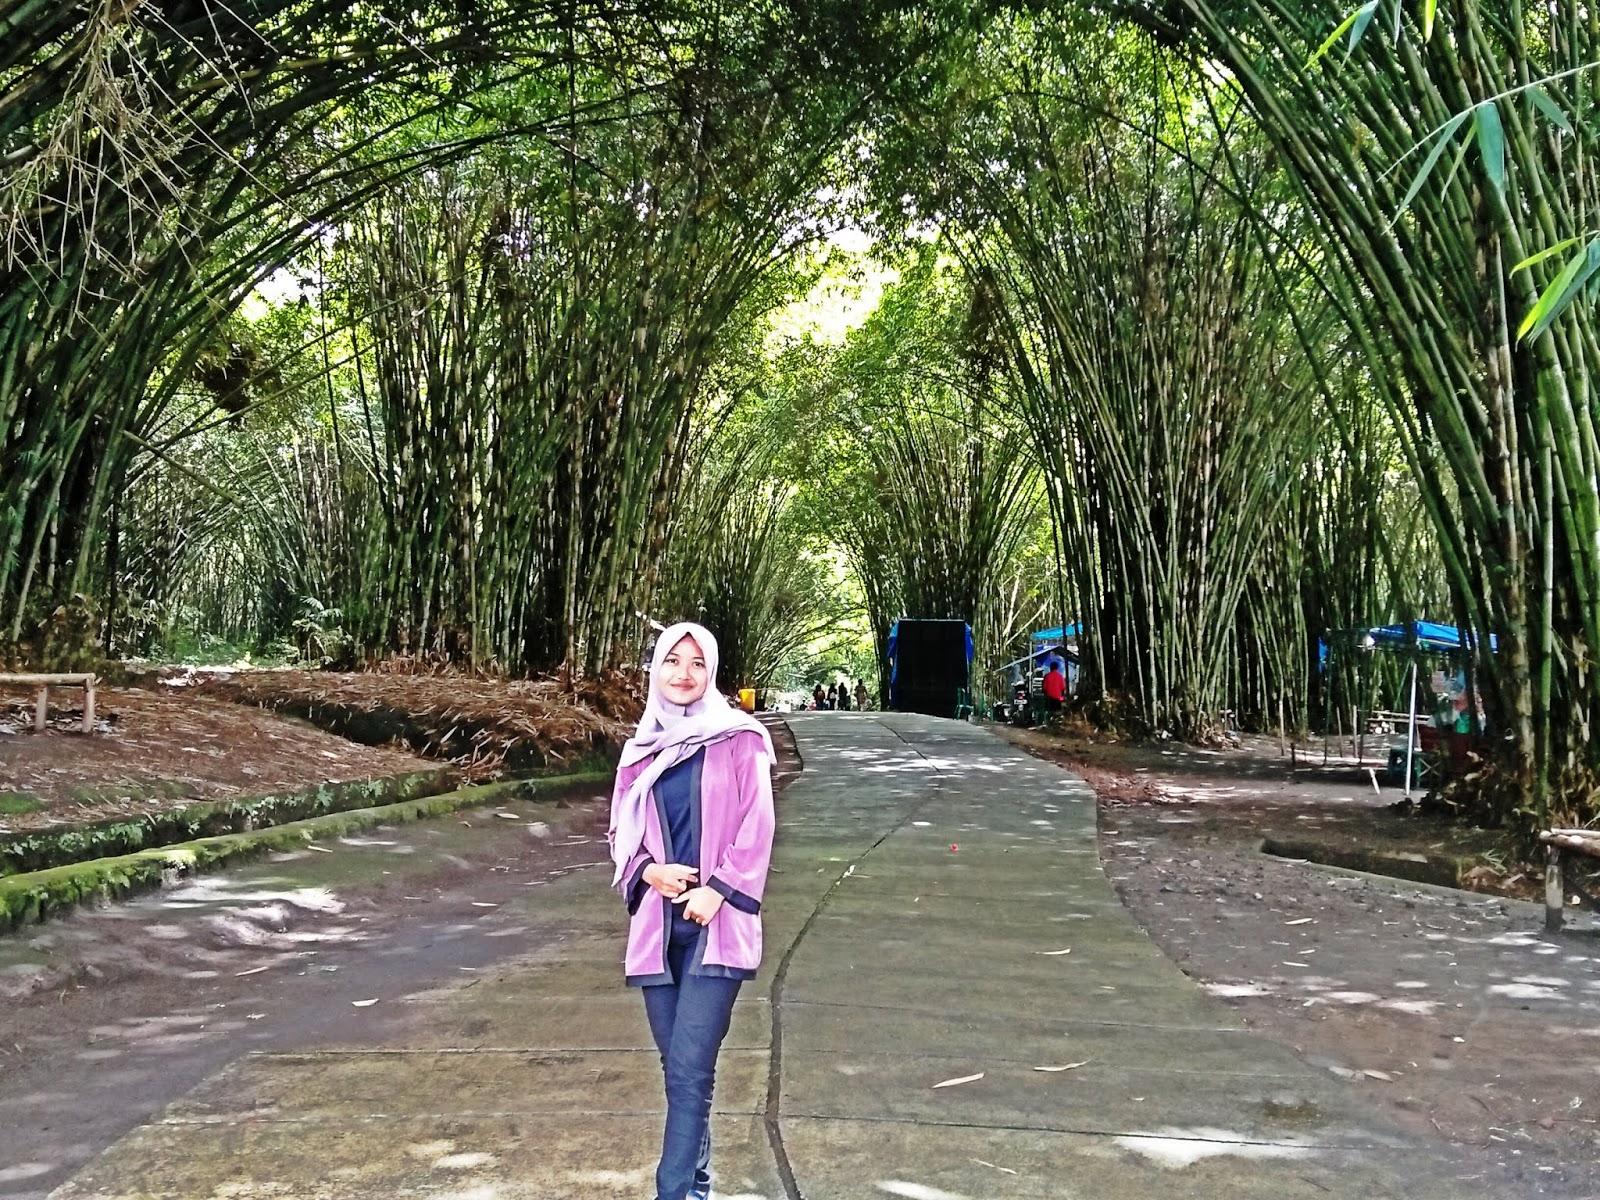 Hutan Bambu Bali View Di Kota Lumajang Jejak Tulisan